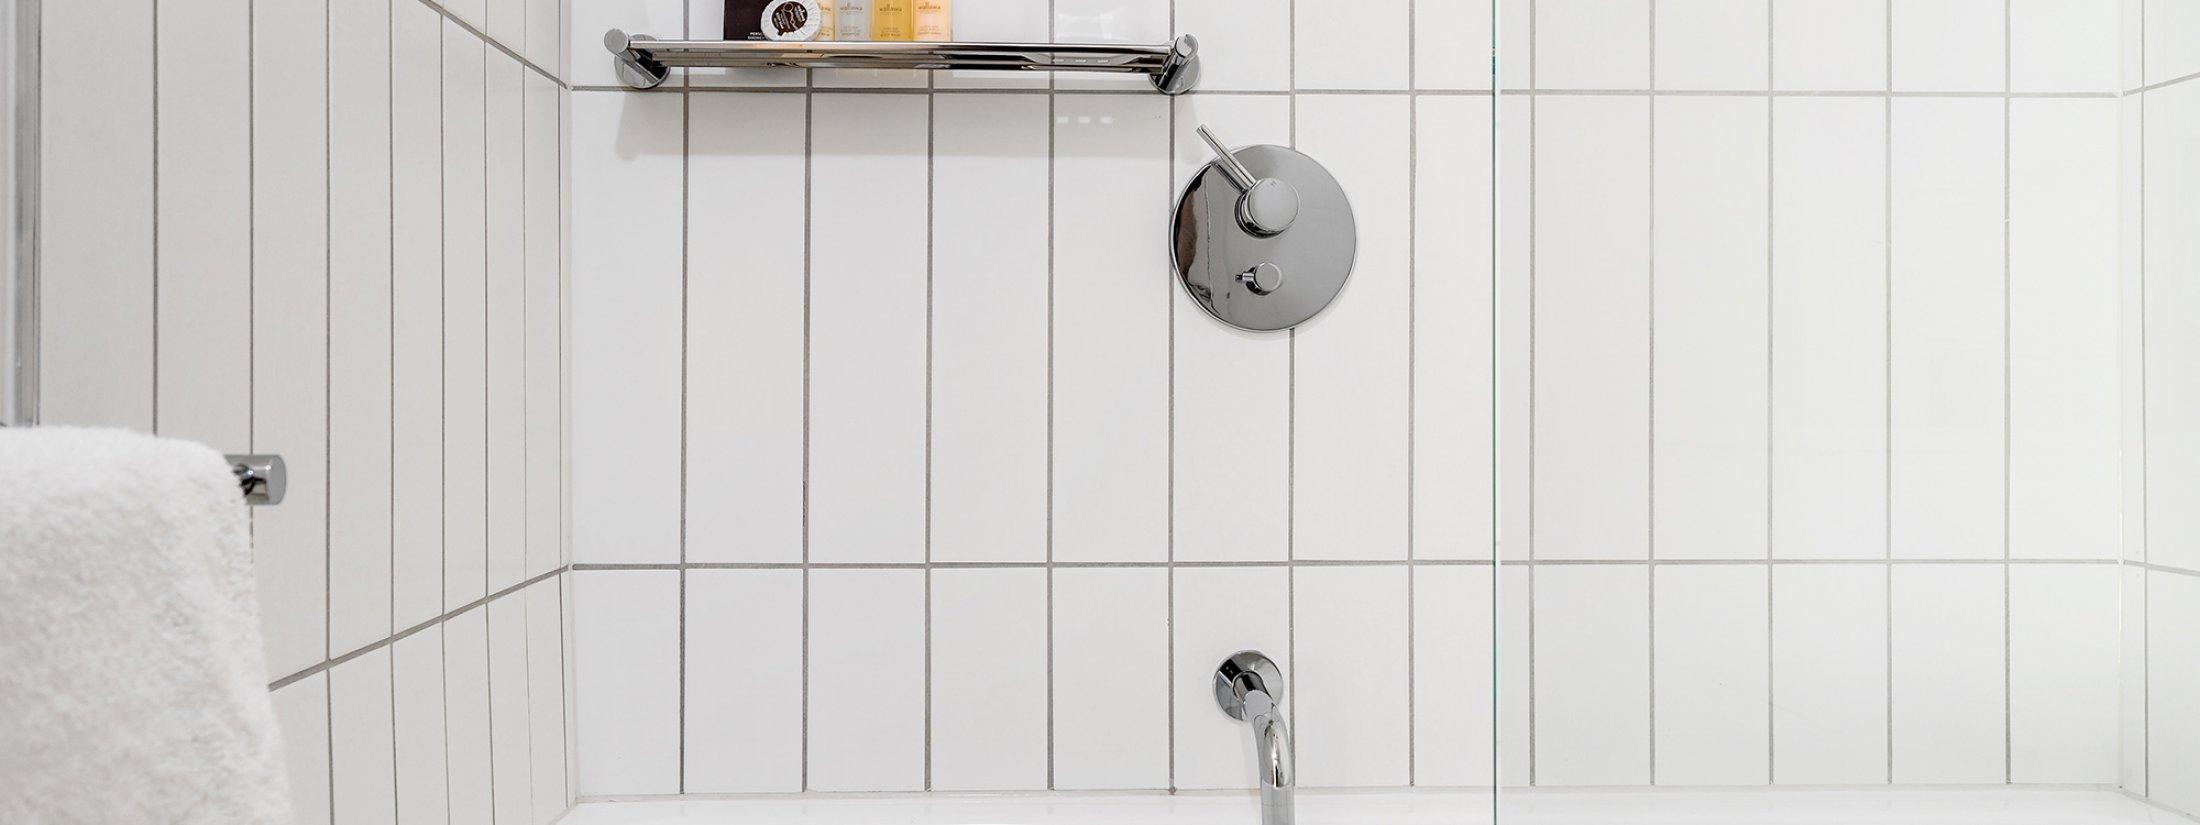 Axel Apartments 203 The Bonfield - Glen Iris - Bathroom shared with bath